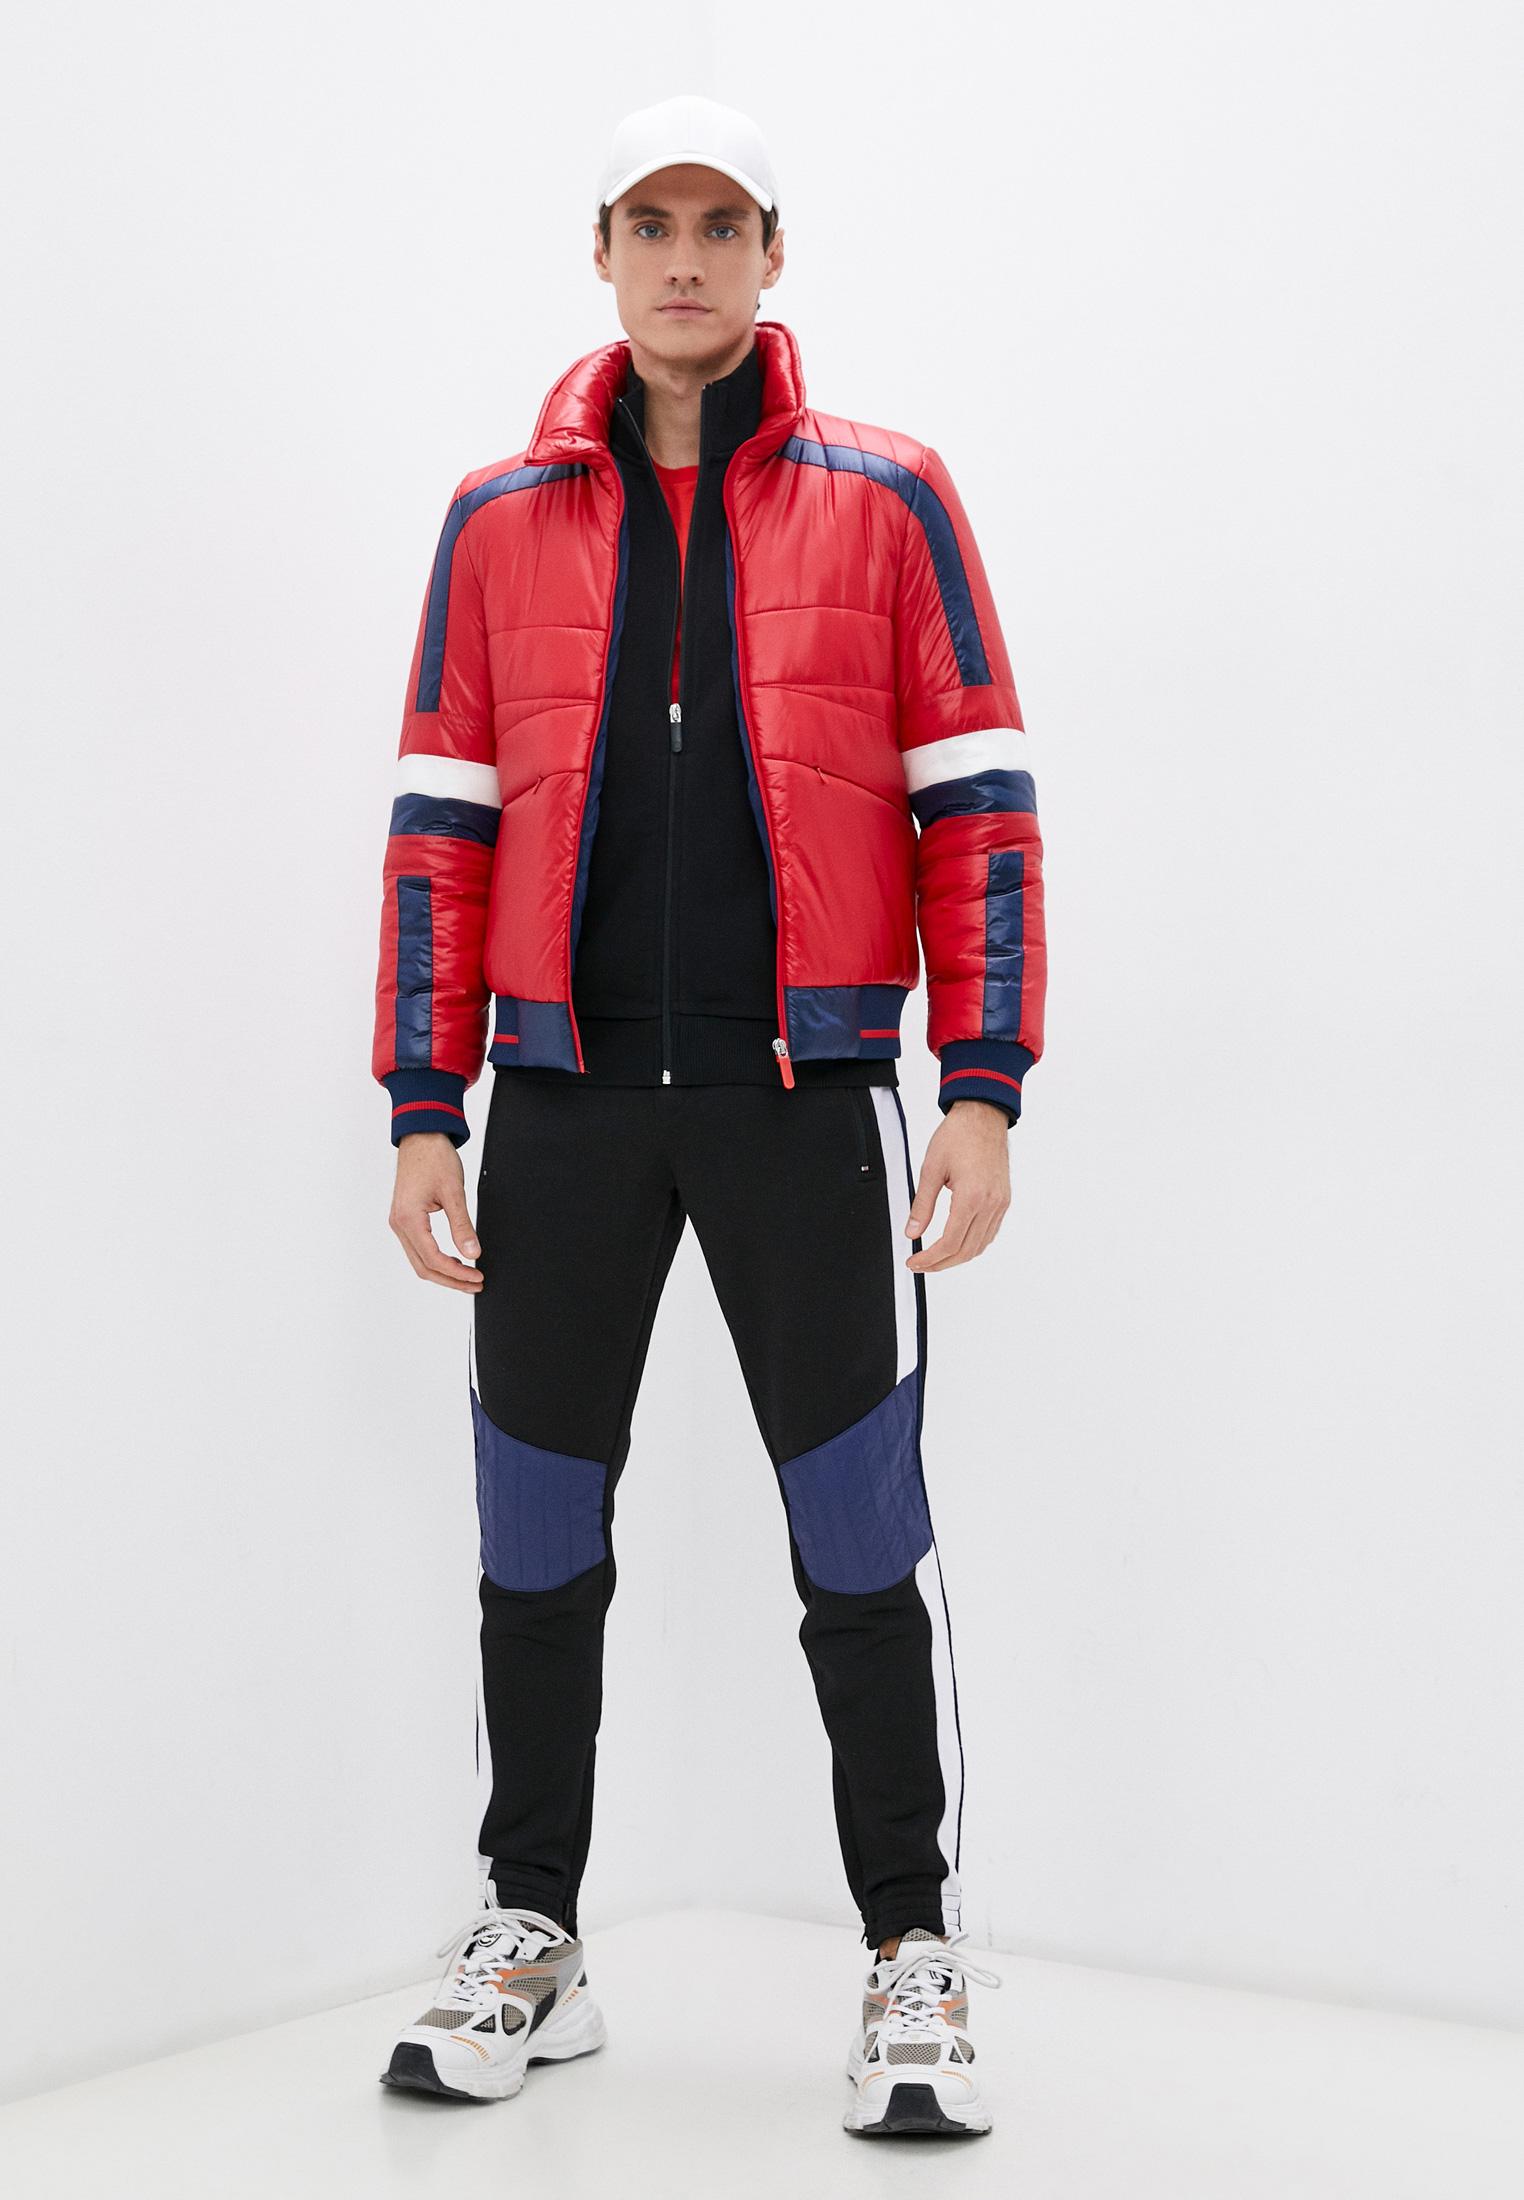 Мужская куртка Bikkembergs (Биккембергс) C H 082 01 T 9846: изображение 9